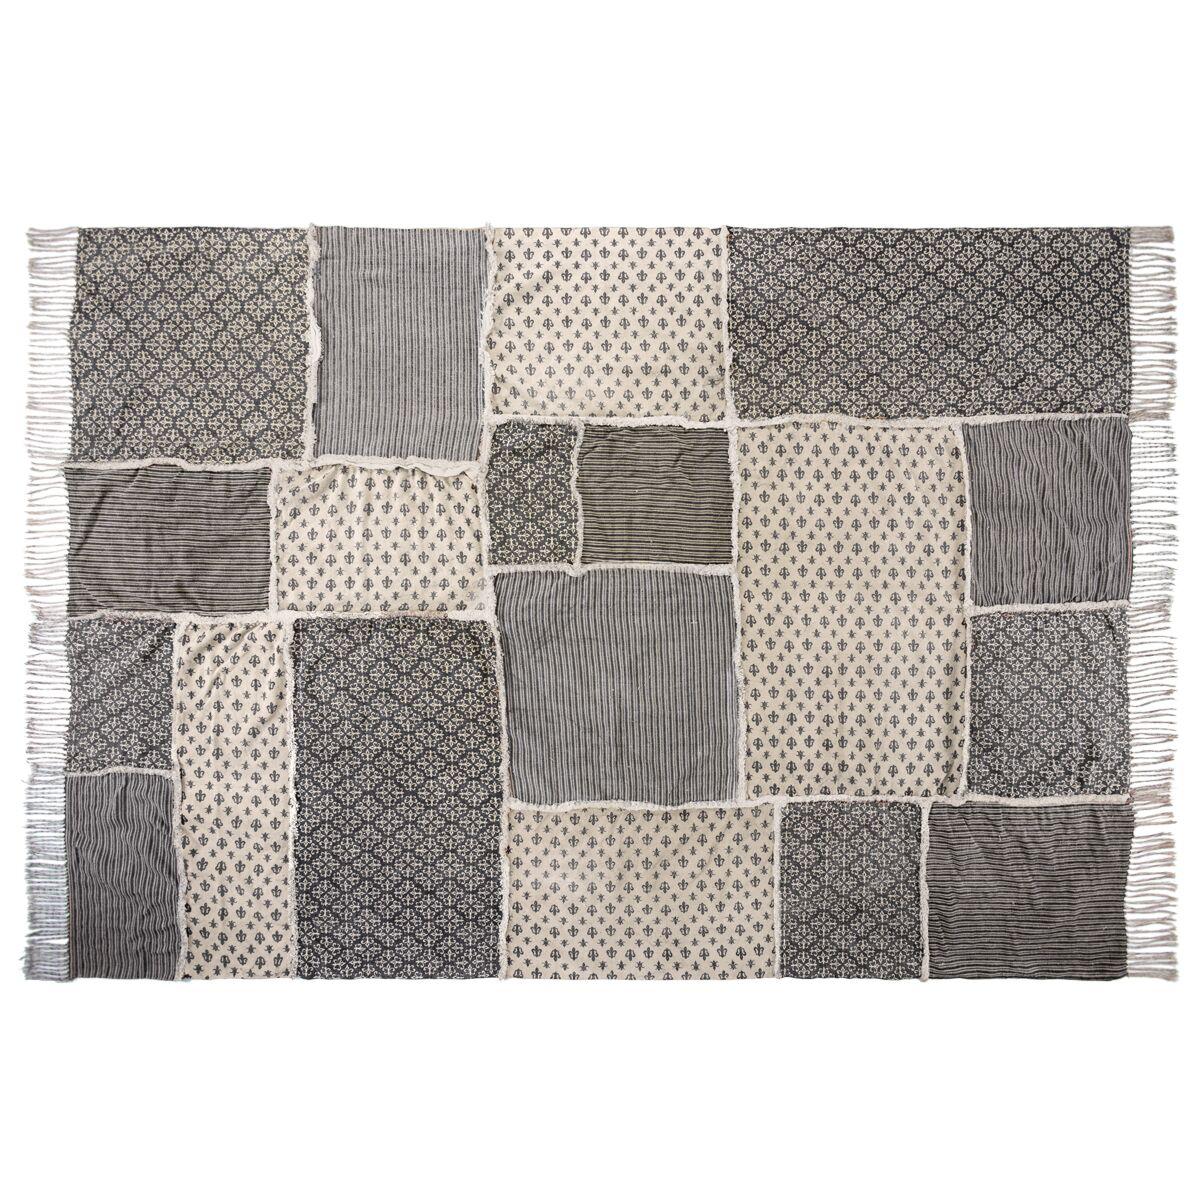 Magellan Black/Gray Area Rug Rug Size: 8' x 11'